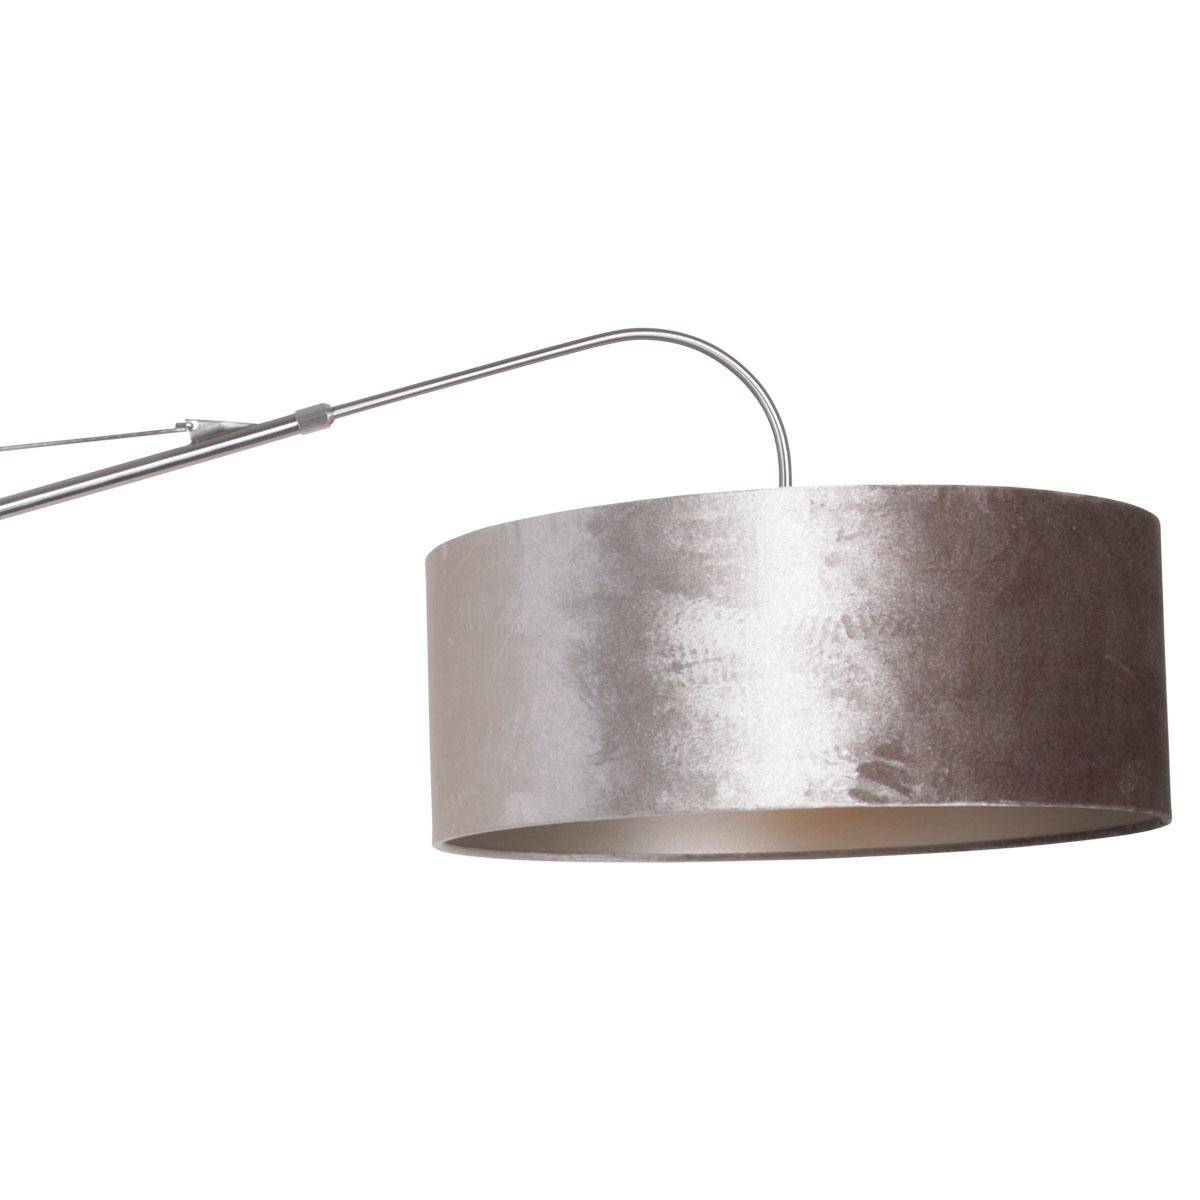 Steinhauer Wandlamp elegant classy 8131 staal zilver velours kap goud